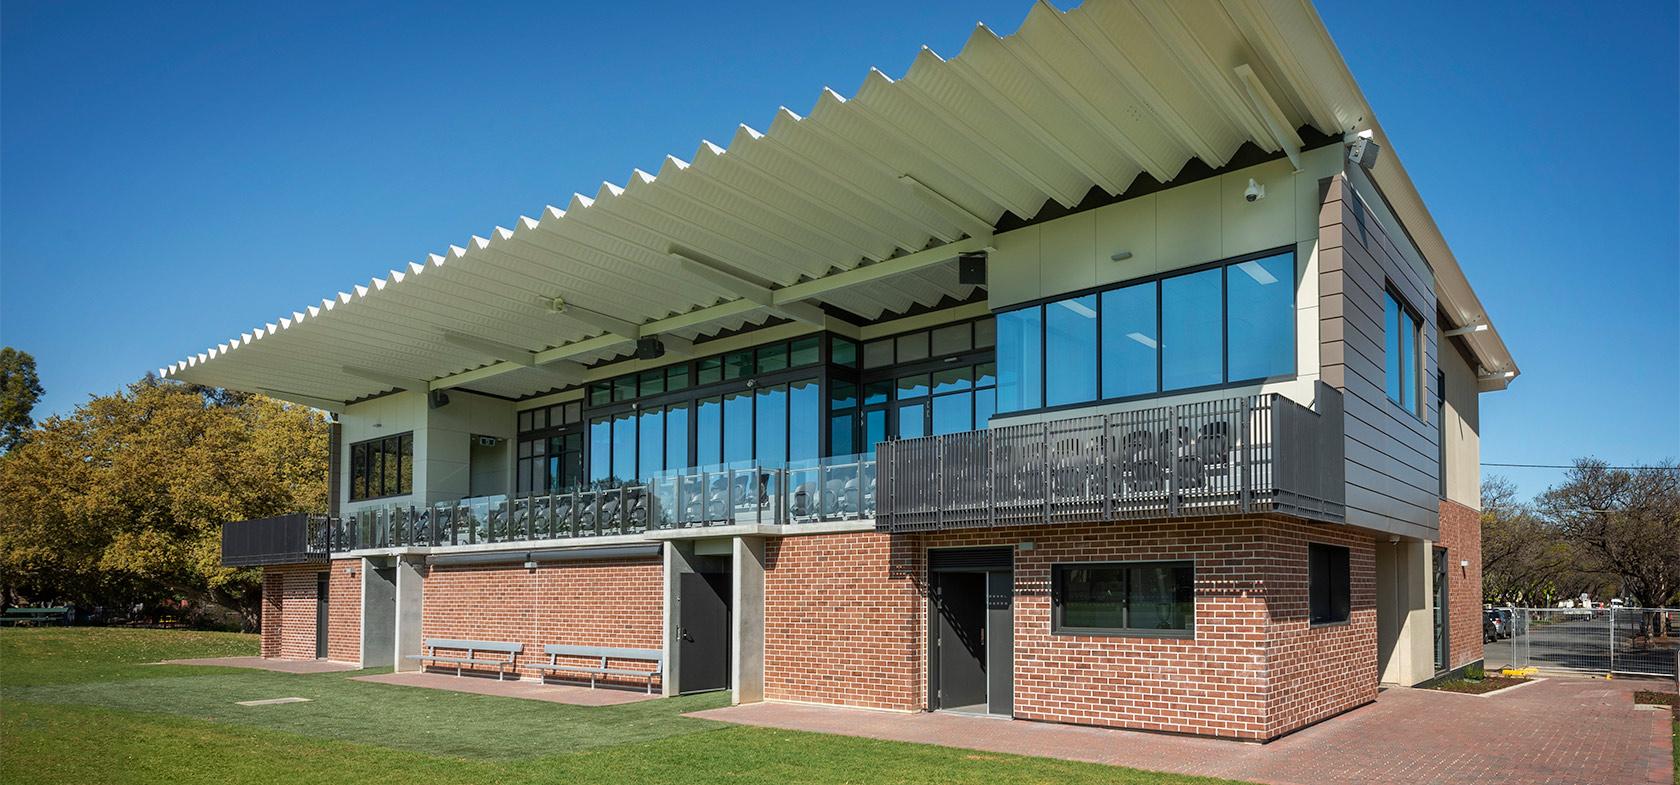 schiavello construction adelaide goodwood oval sport stadium header banner